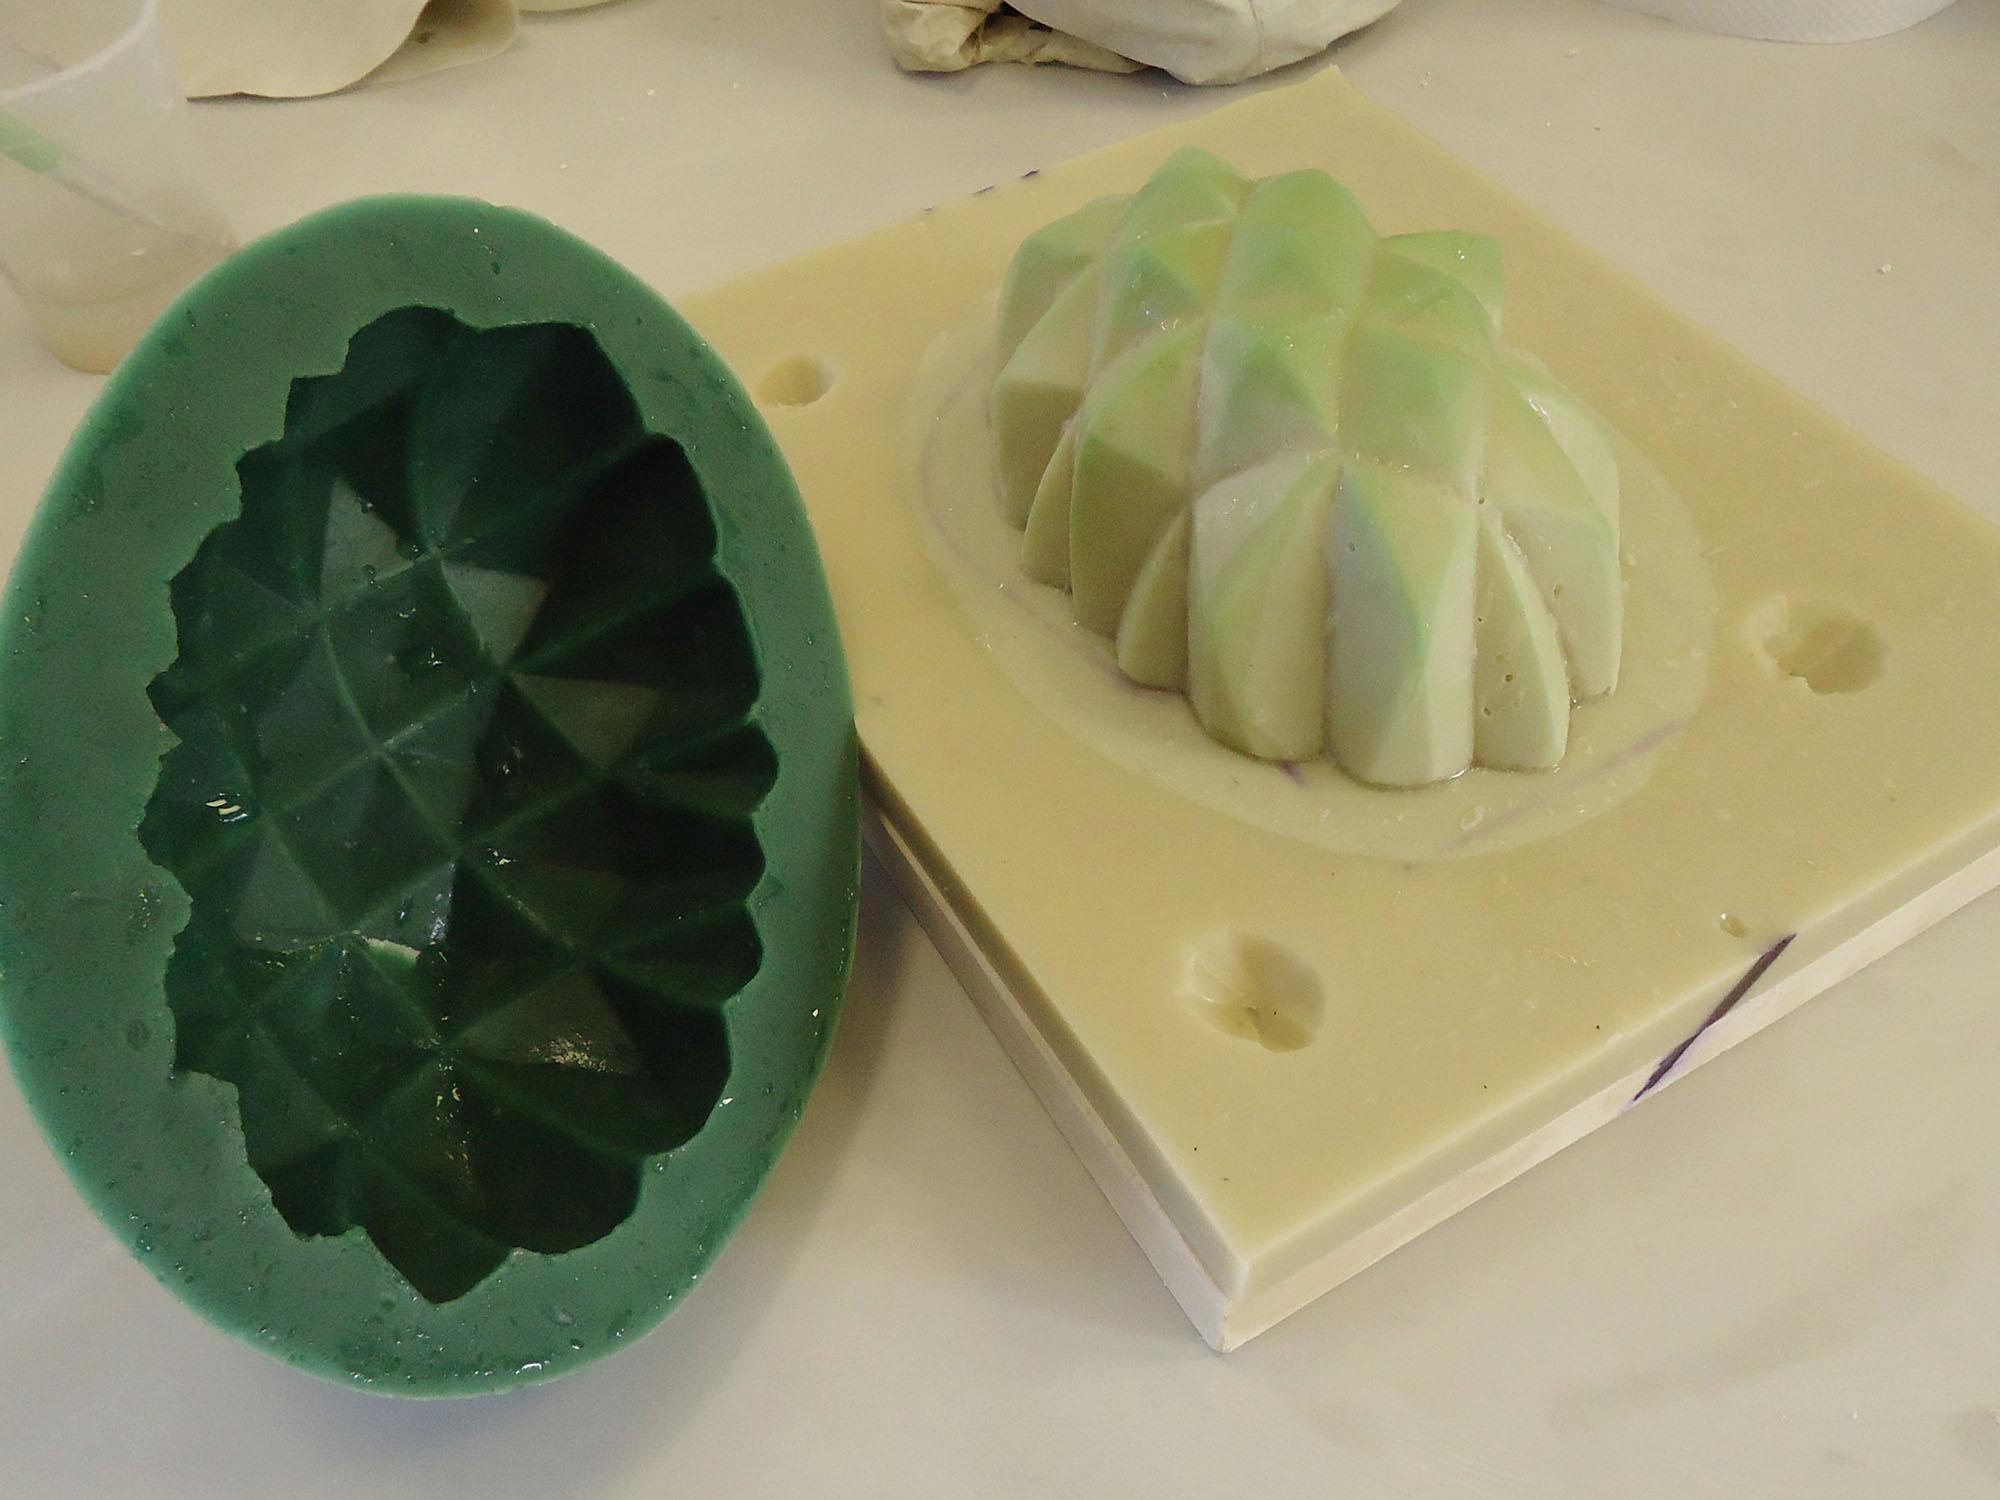 Core skills lost wax casting course | Angela Jarman | Studio Glass Artist | Hertfordshire, UK